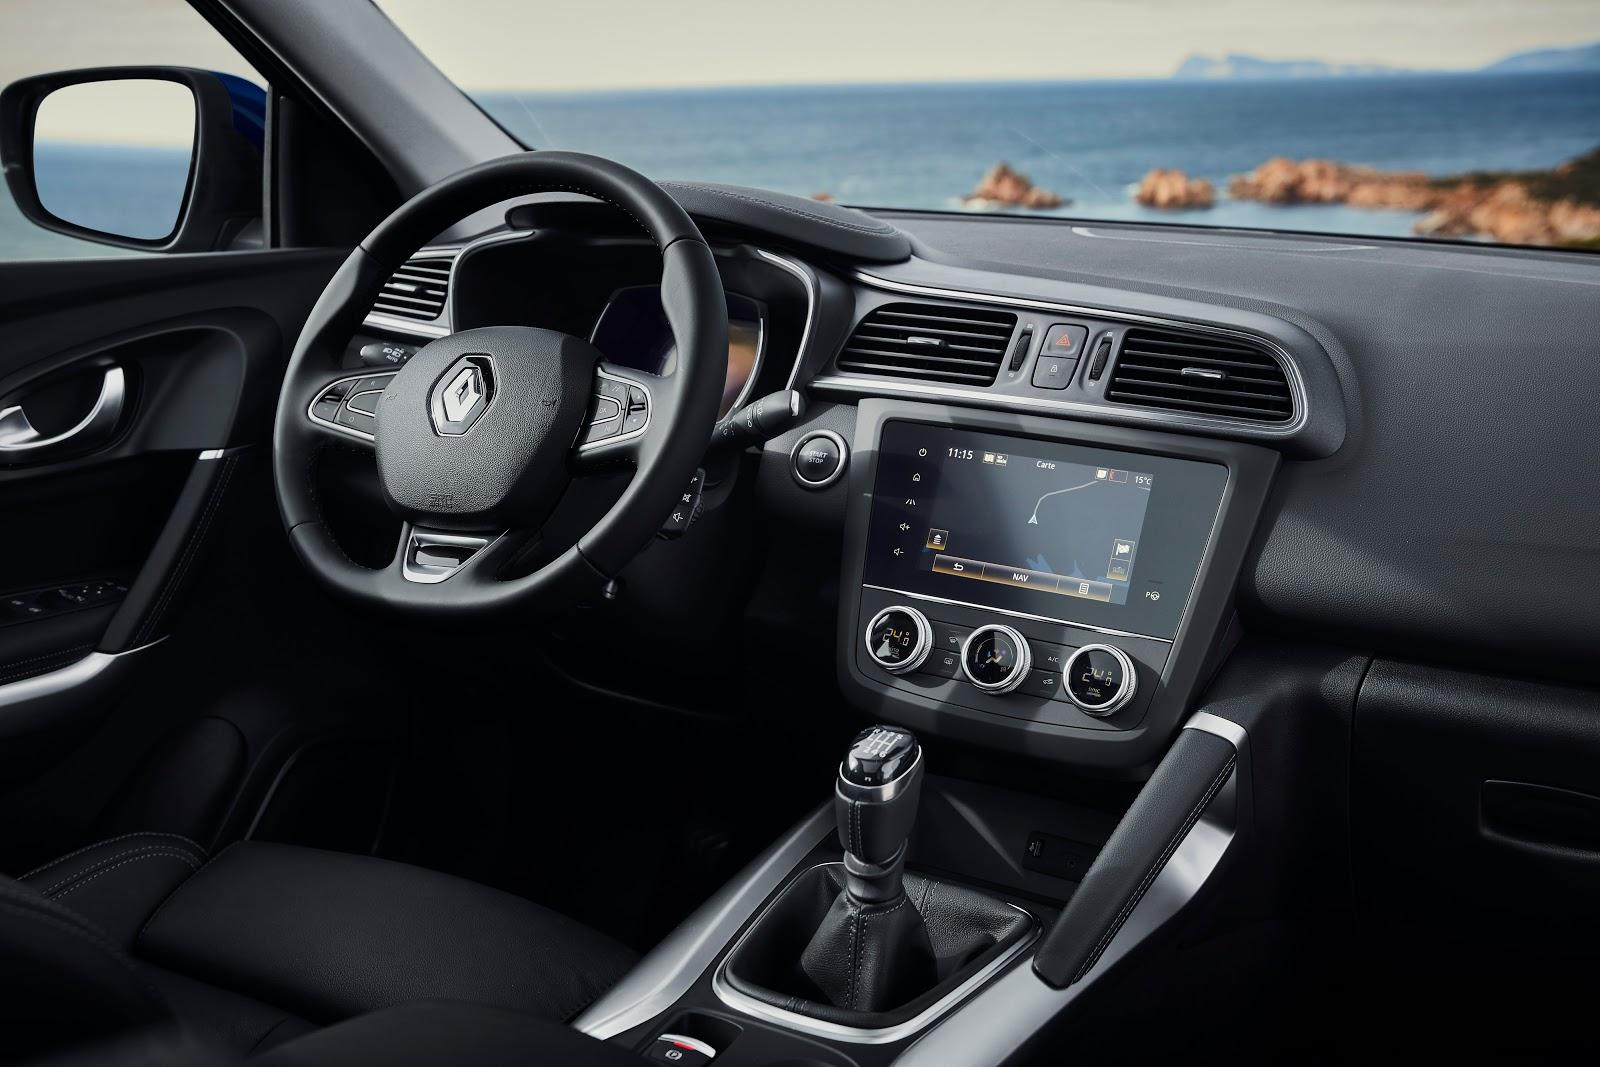 2018 NEW2BRENAULT2BKADJAR 080 Renault KADJAR 1.5 Blue dCi 115hp Sport Edition, μόνο με 21.760€